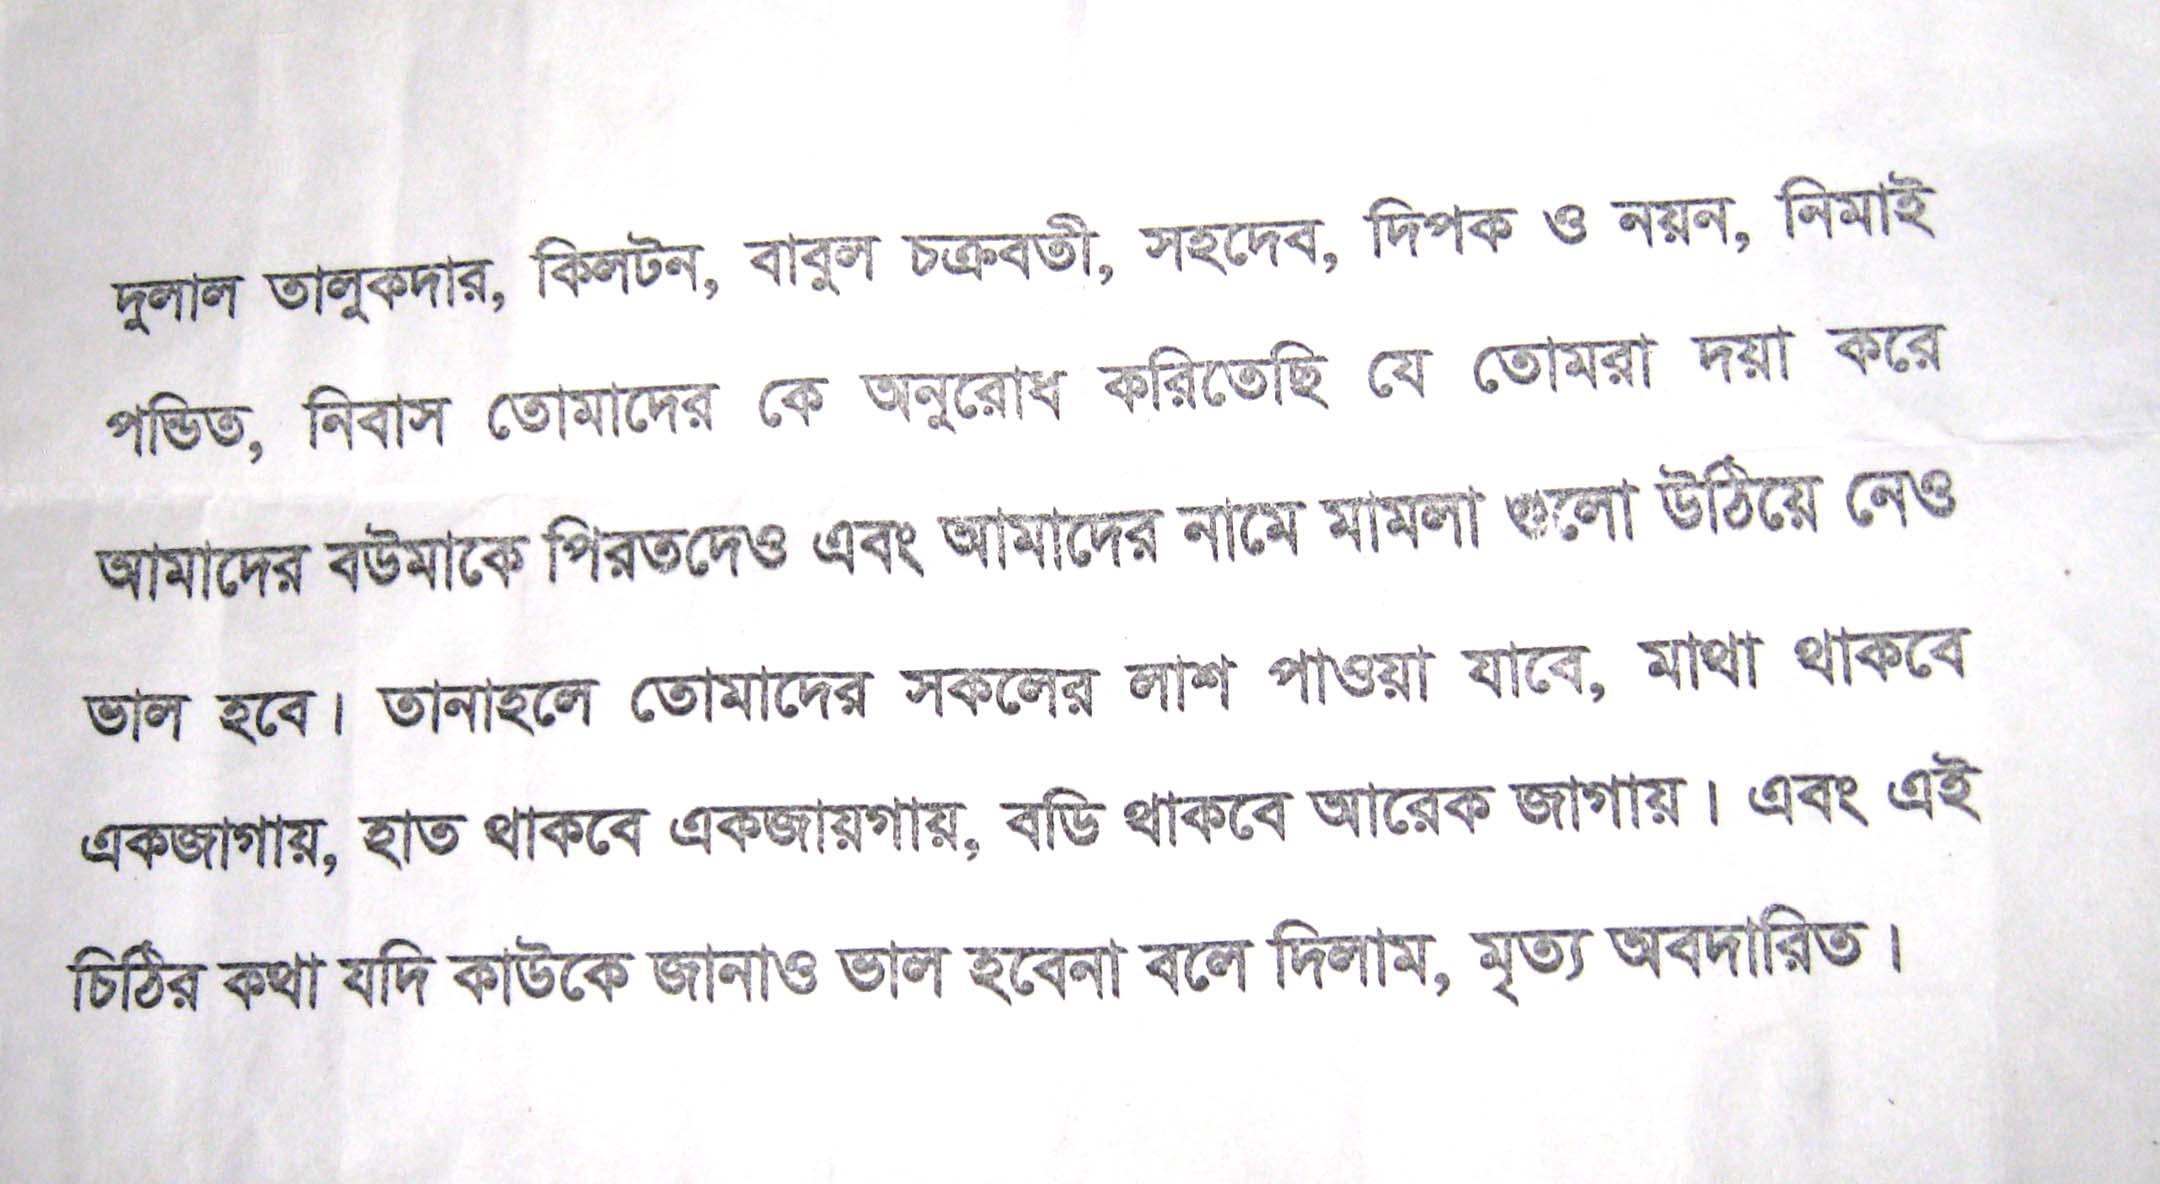 Hajigonj news pic